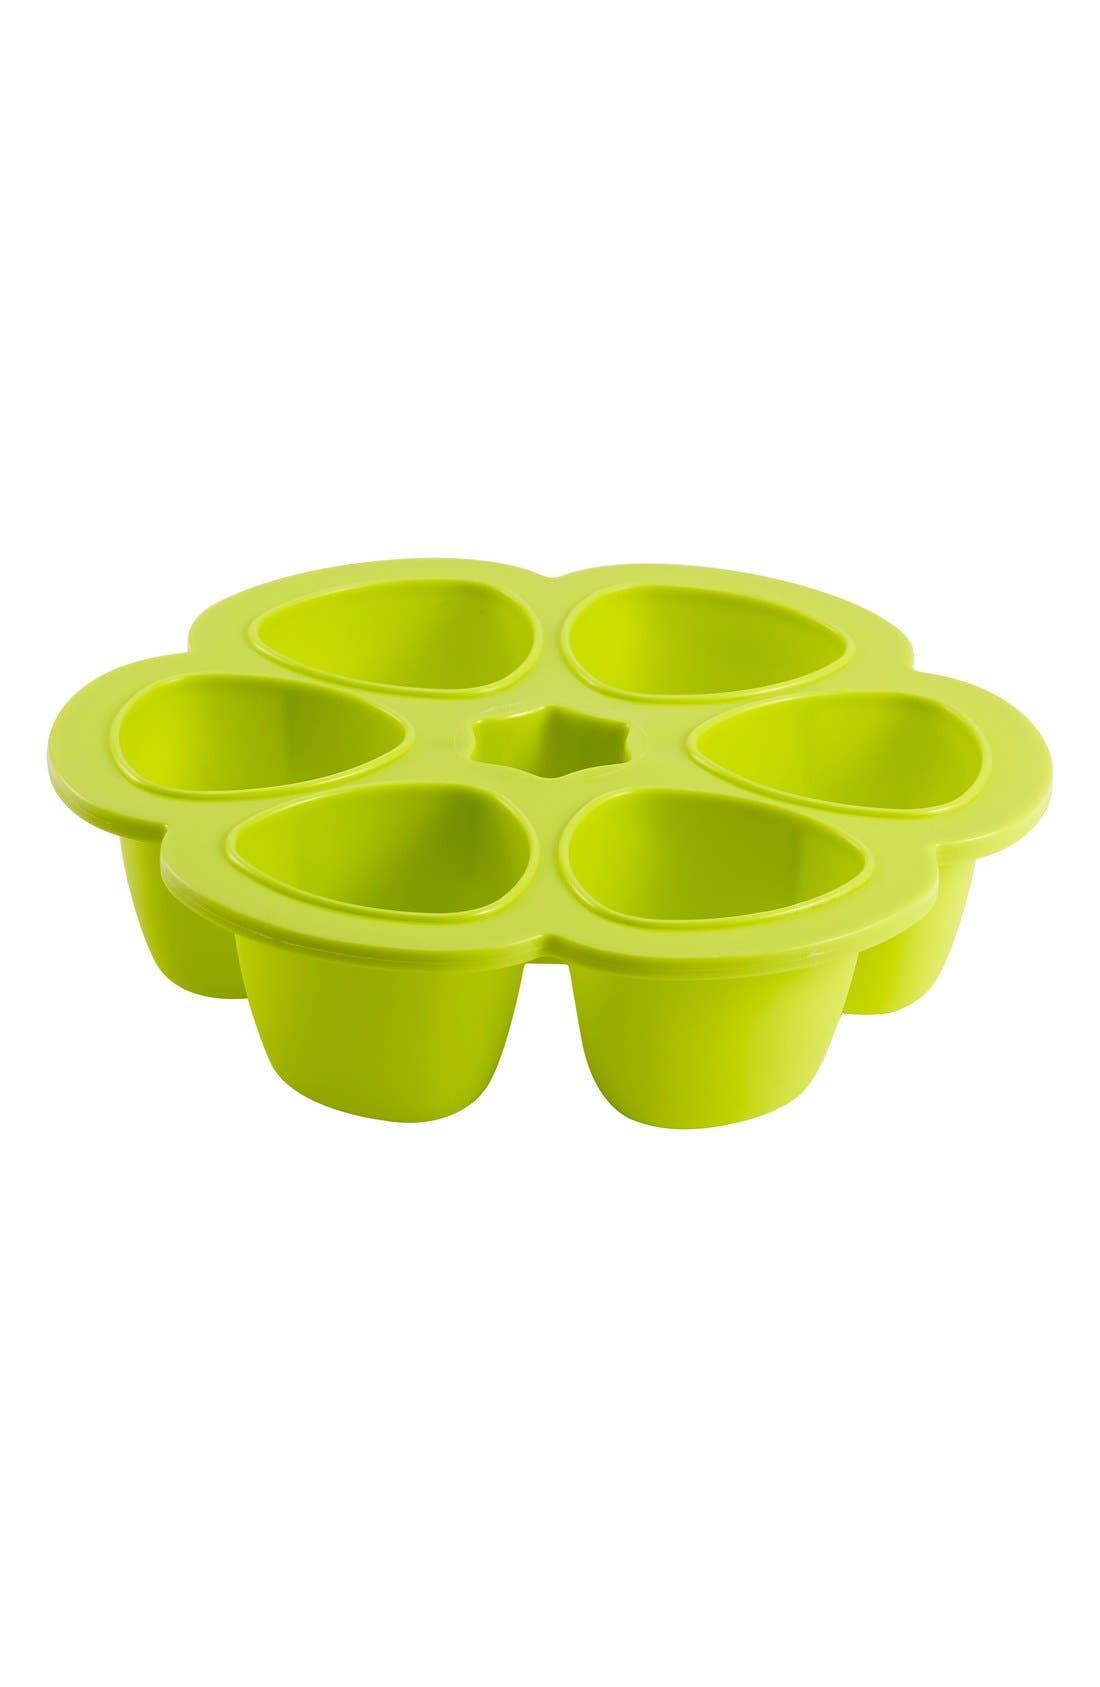 BÉABA 'Multiportions' 3 oz. Food Cup Tray